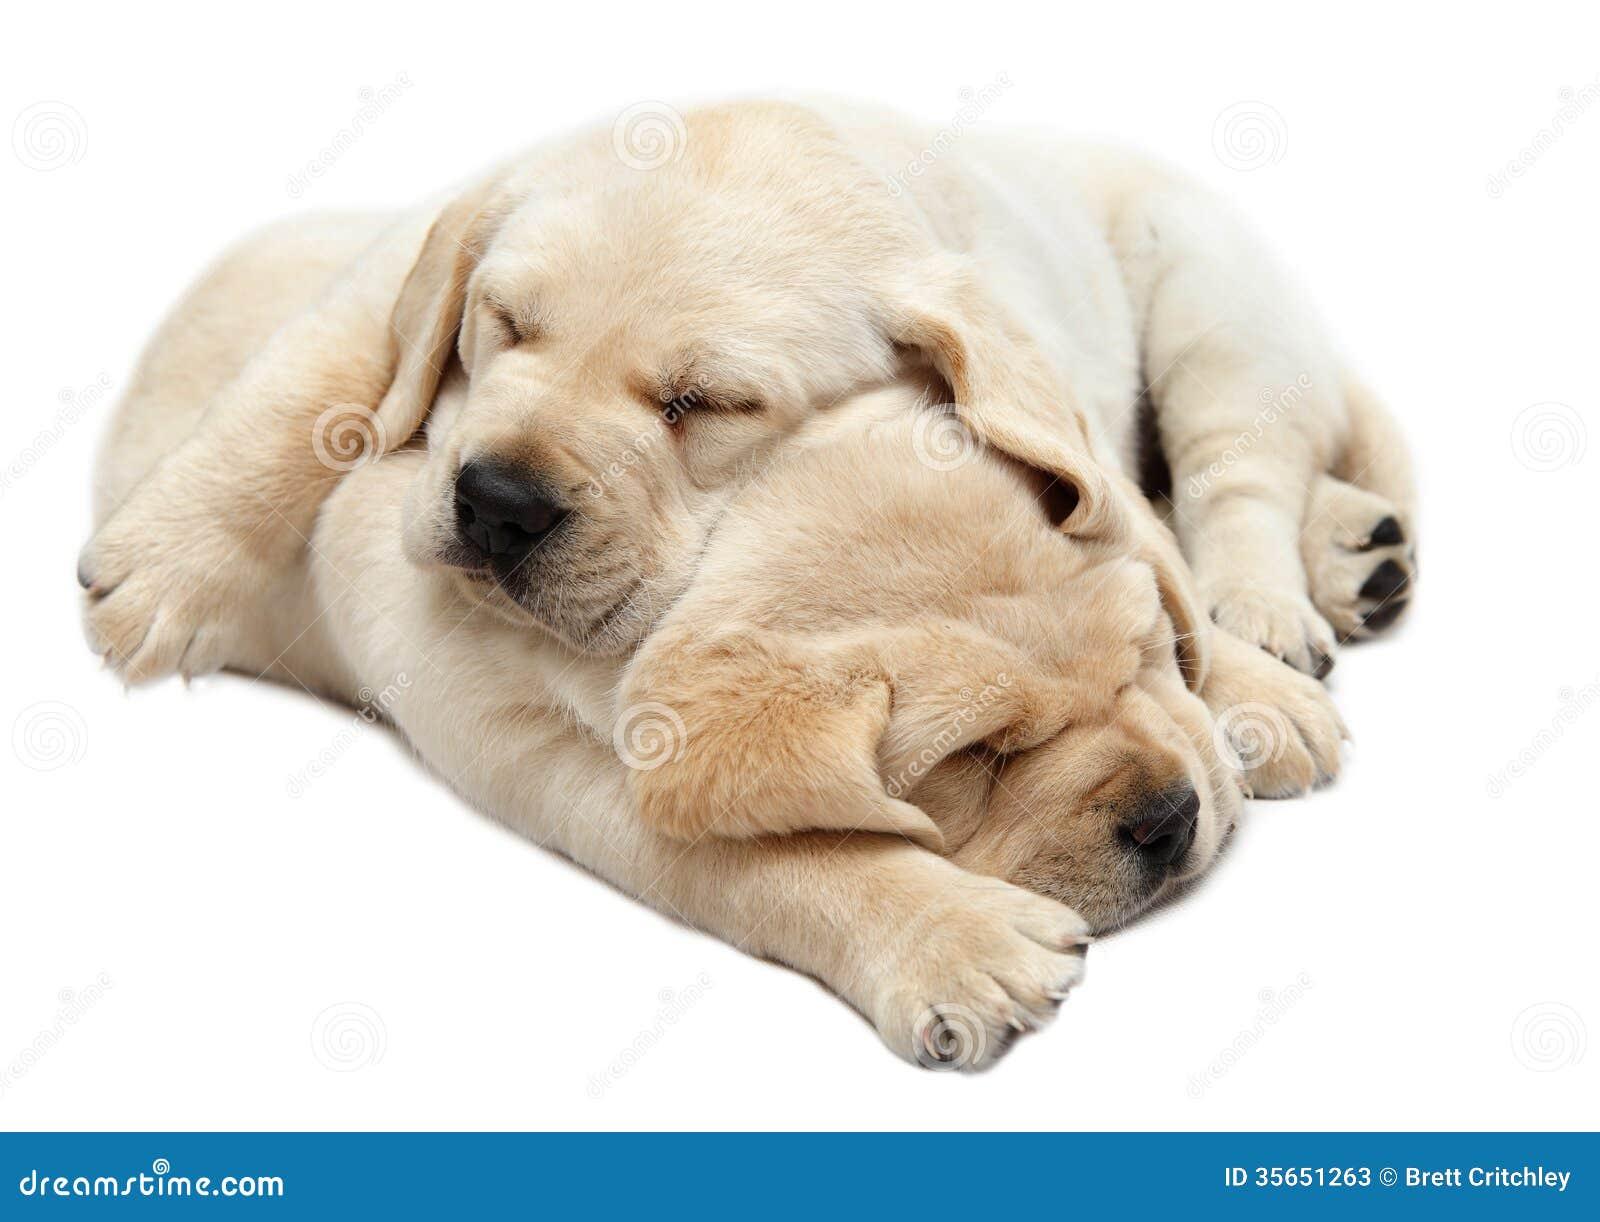 Labrador Puppies Sleeping Stock s Image